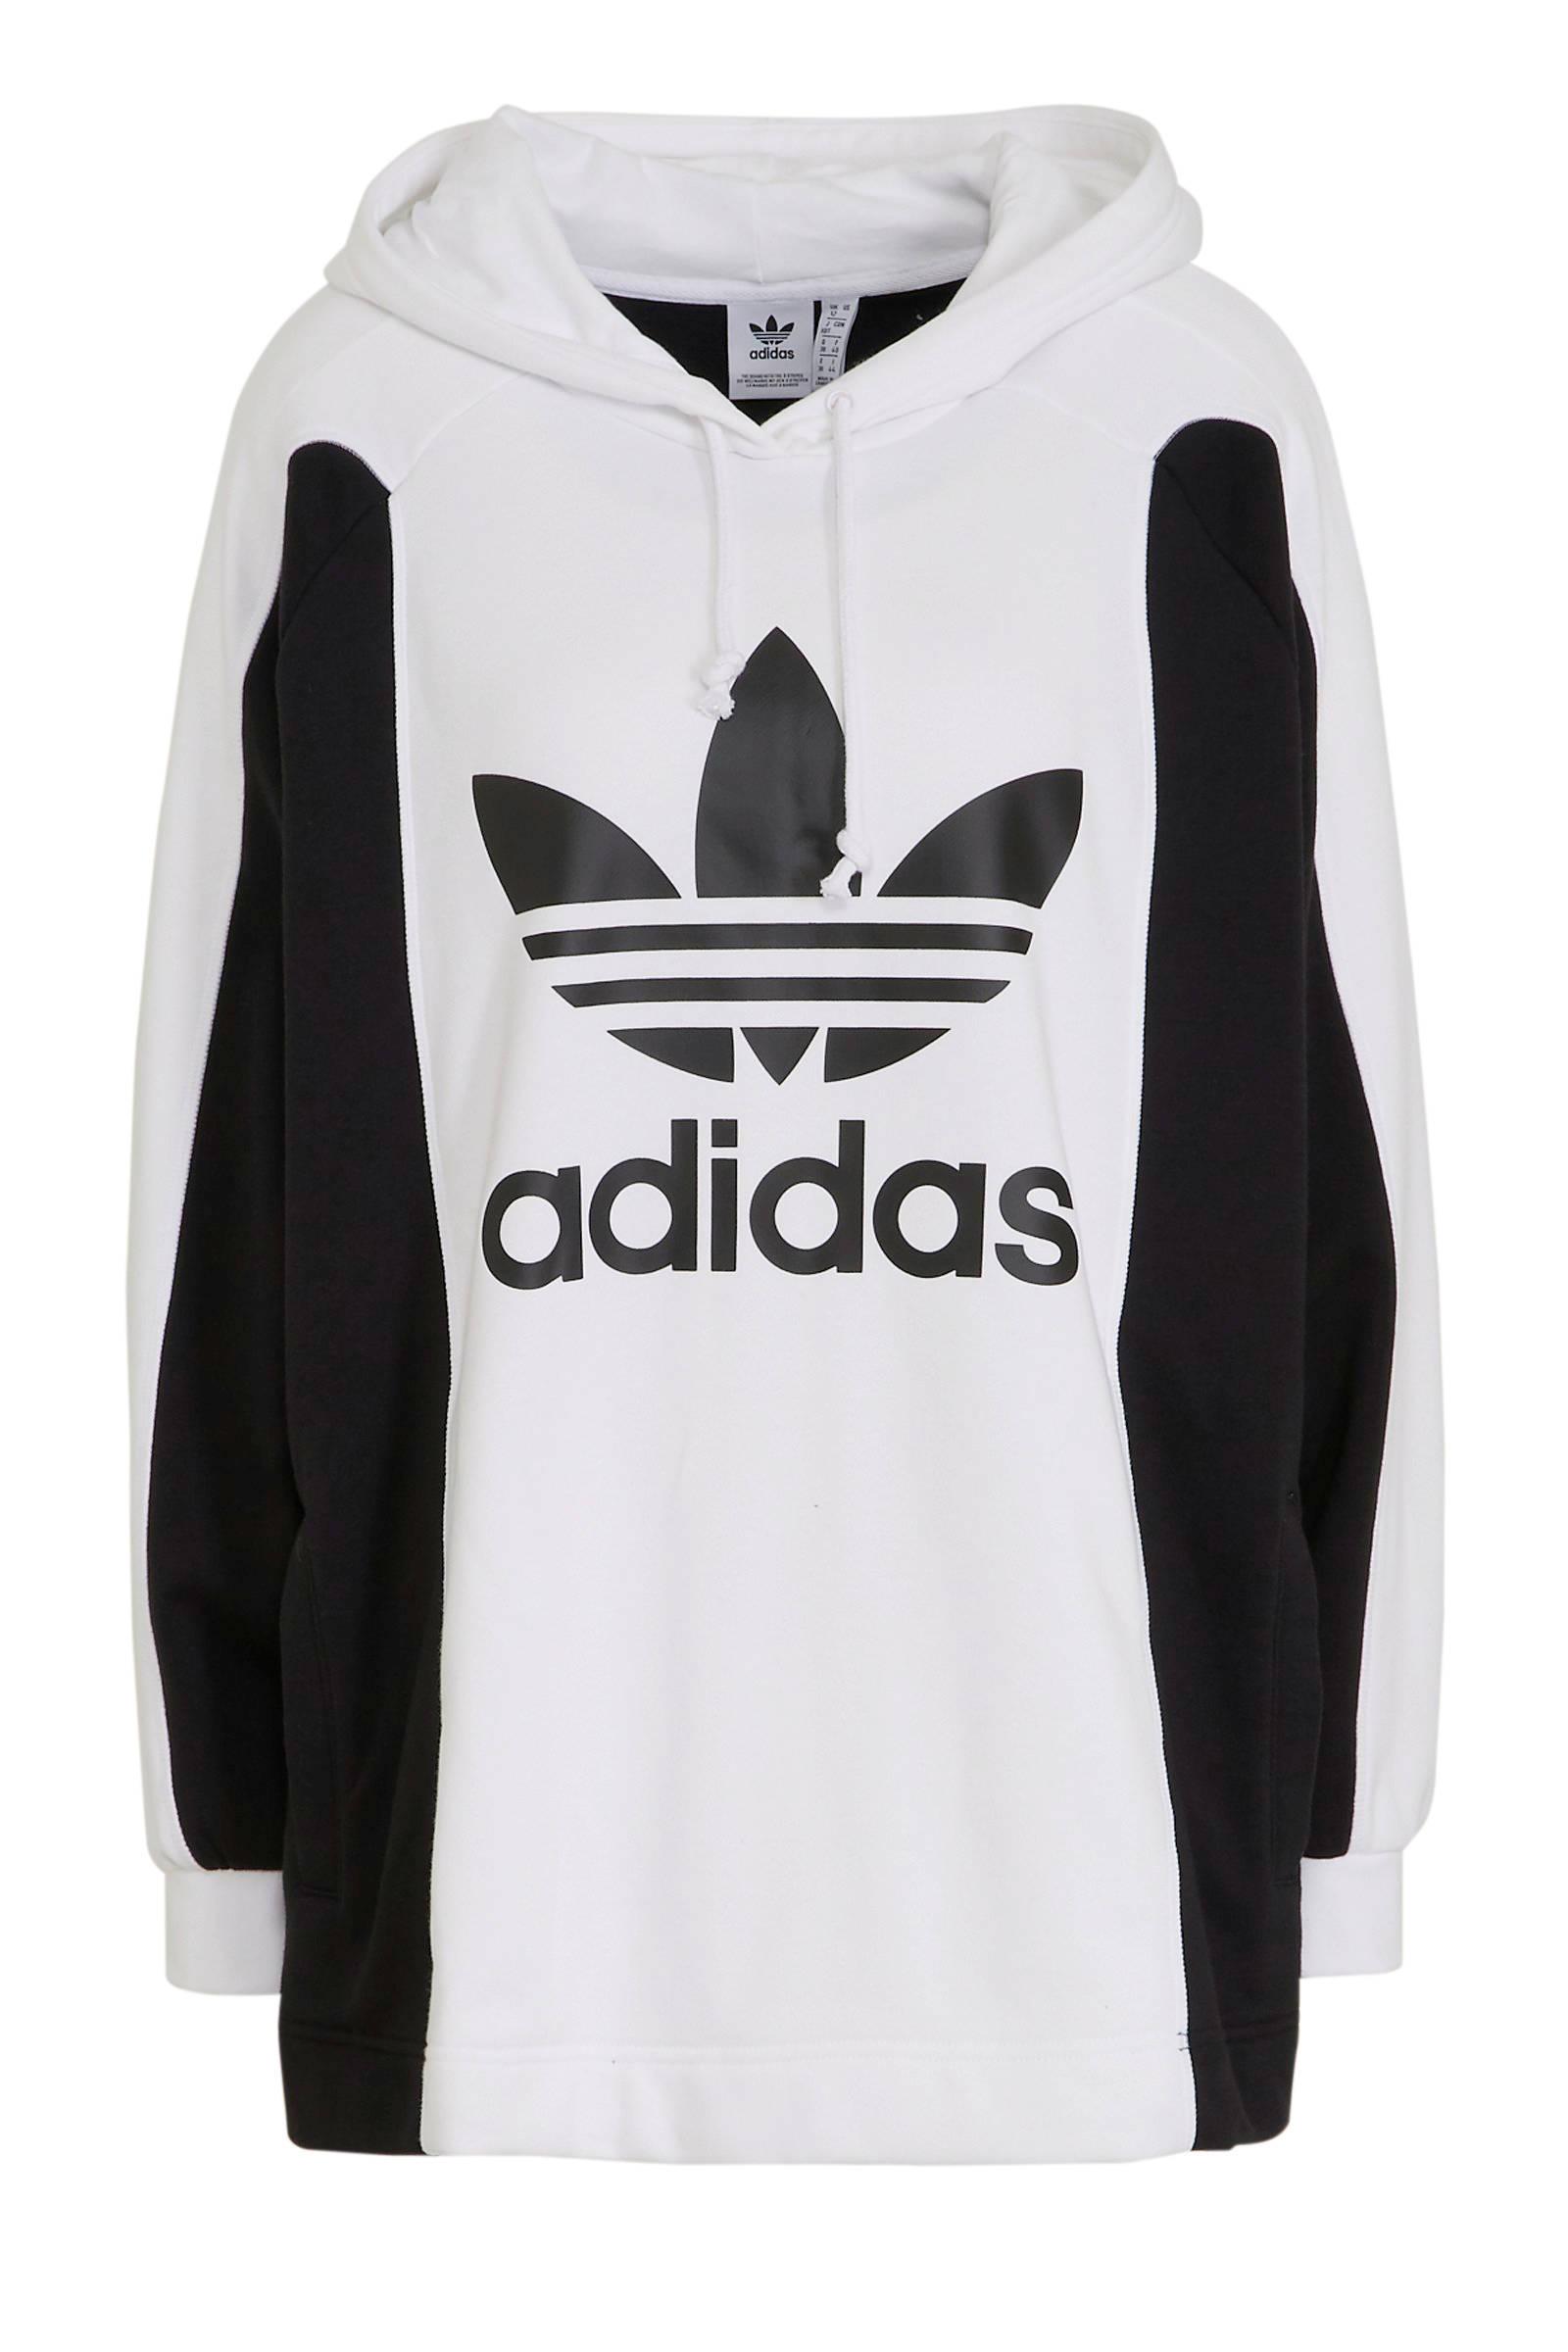 adidas originals adidas Originals oversized sweater wit